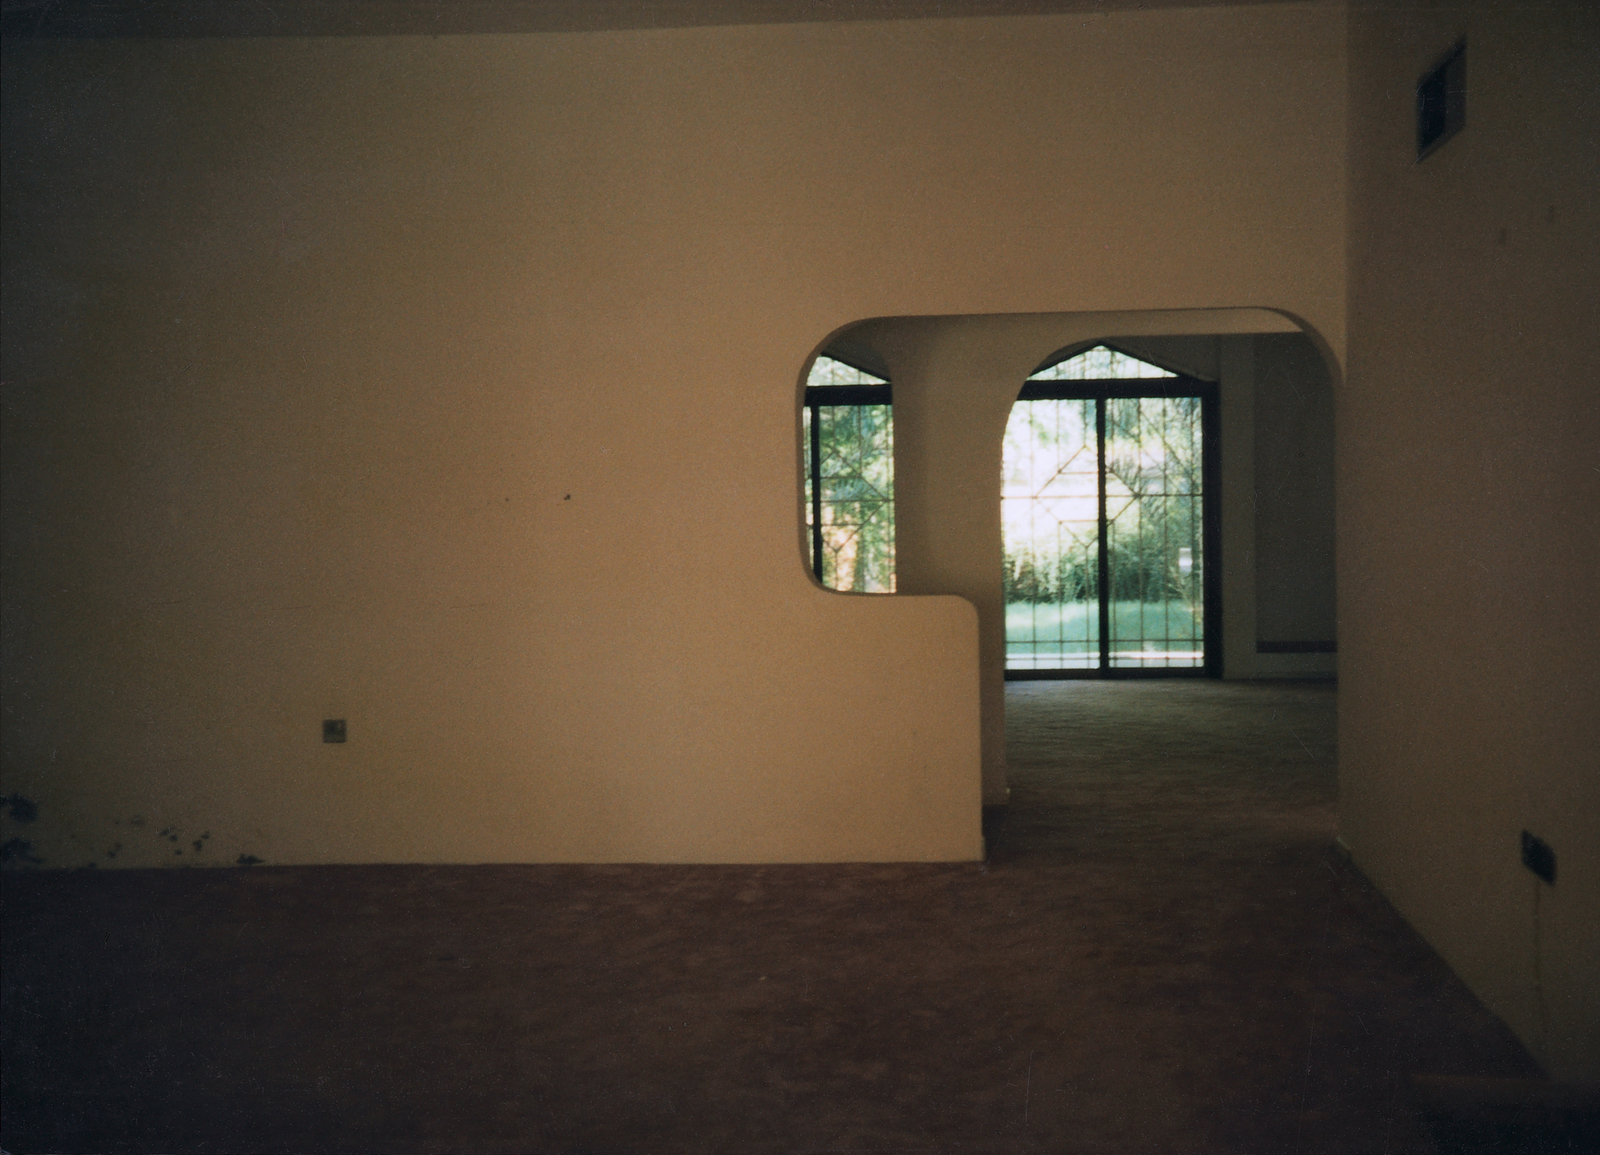 Abu Dhabi - Standard Level Position Residence - 1996